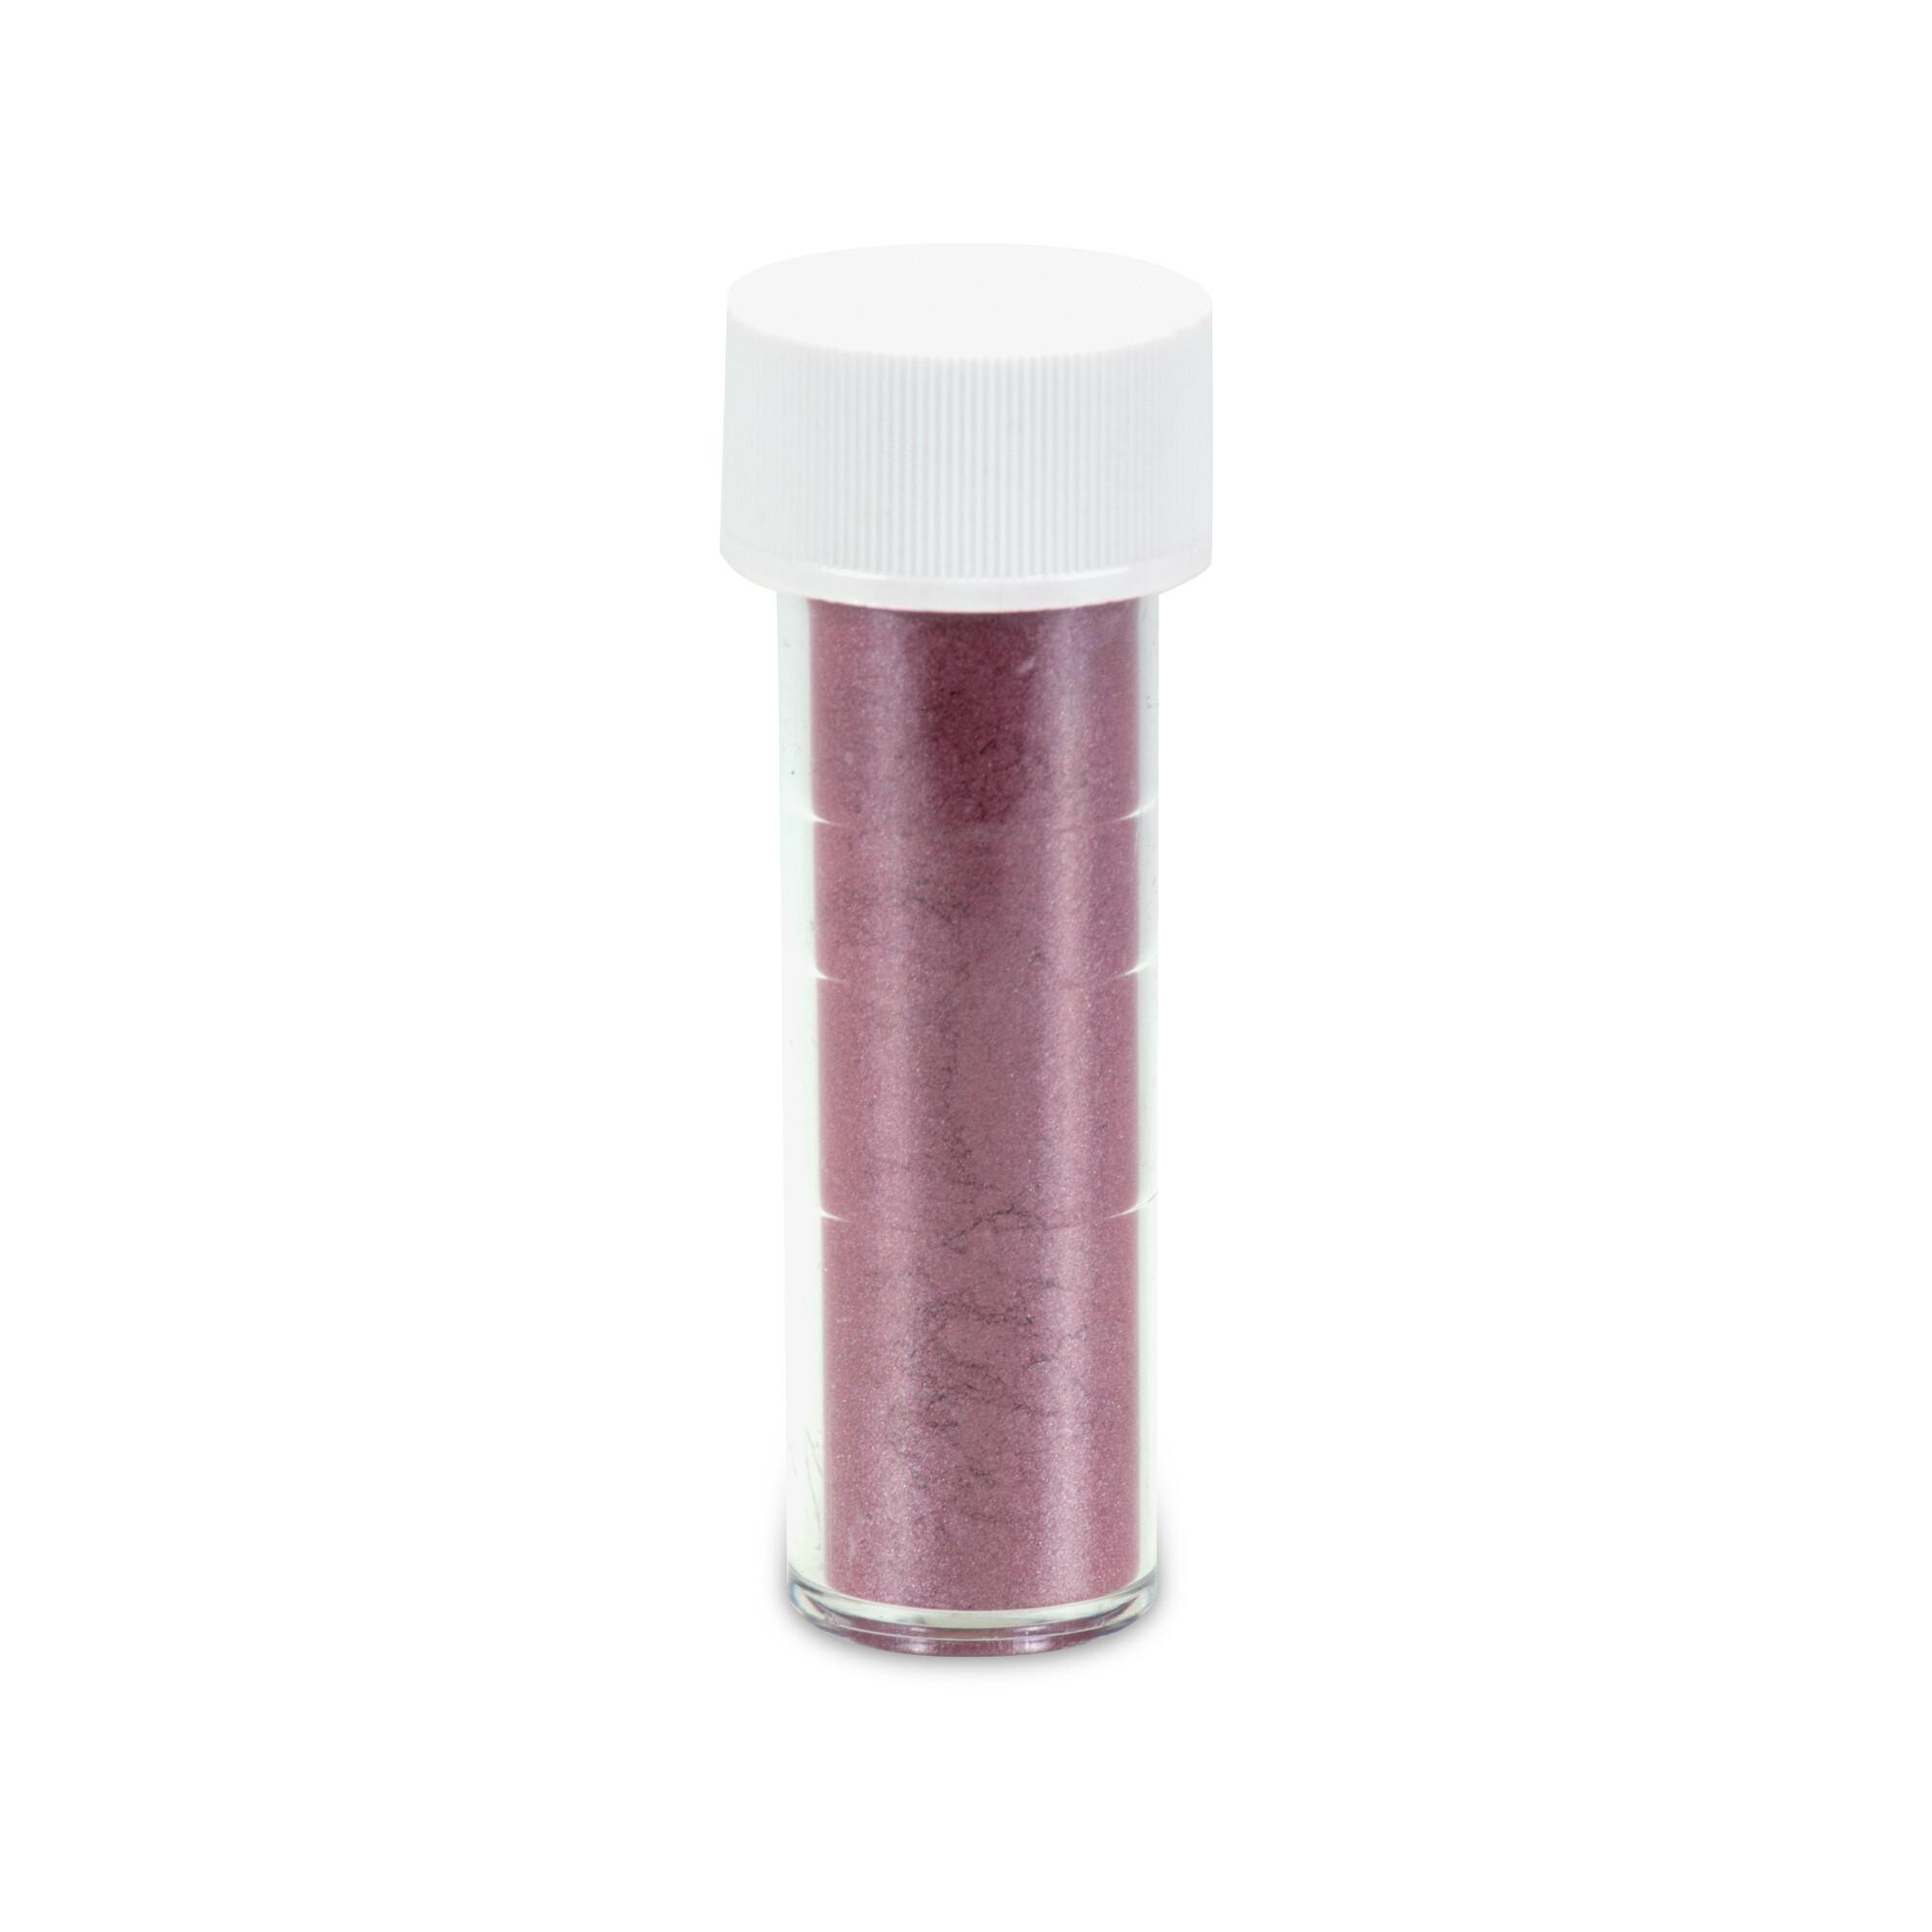 Food colour - Crystalline powder